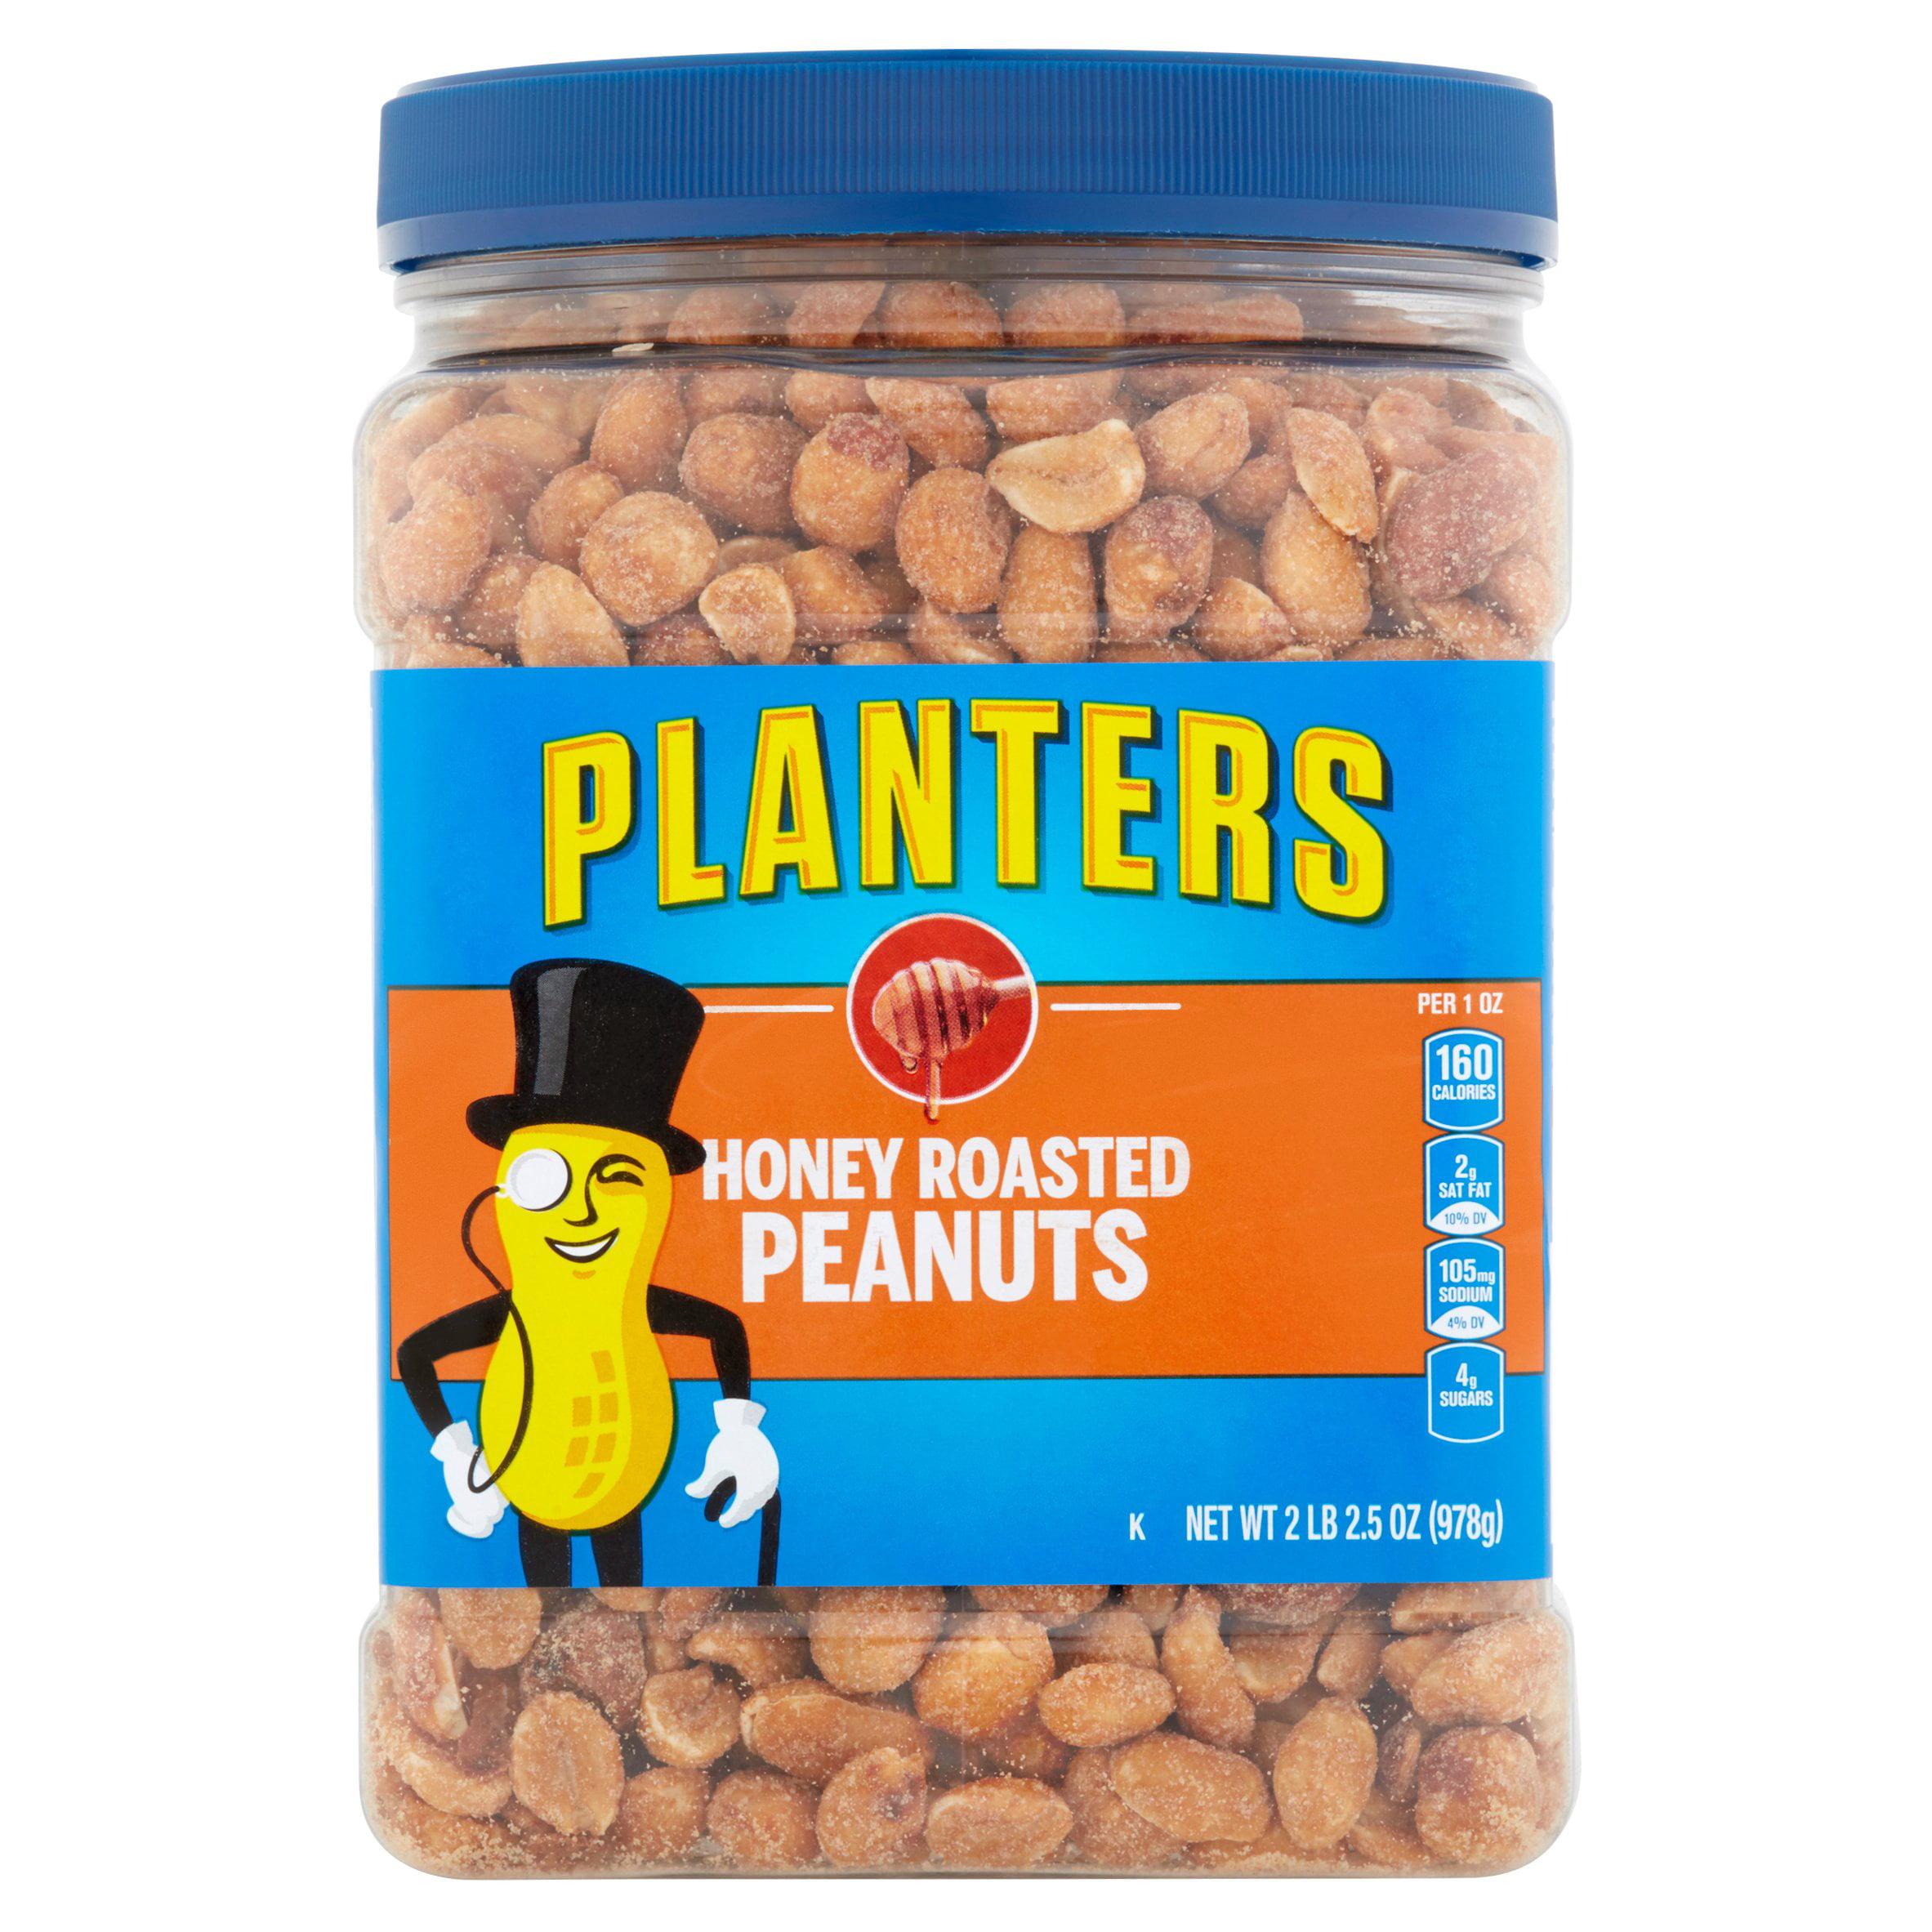 Planters Honey Roasted Peanuts 978g